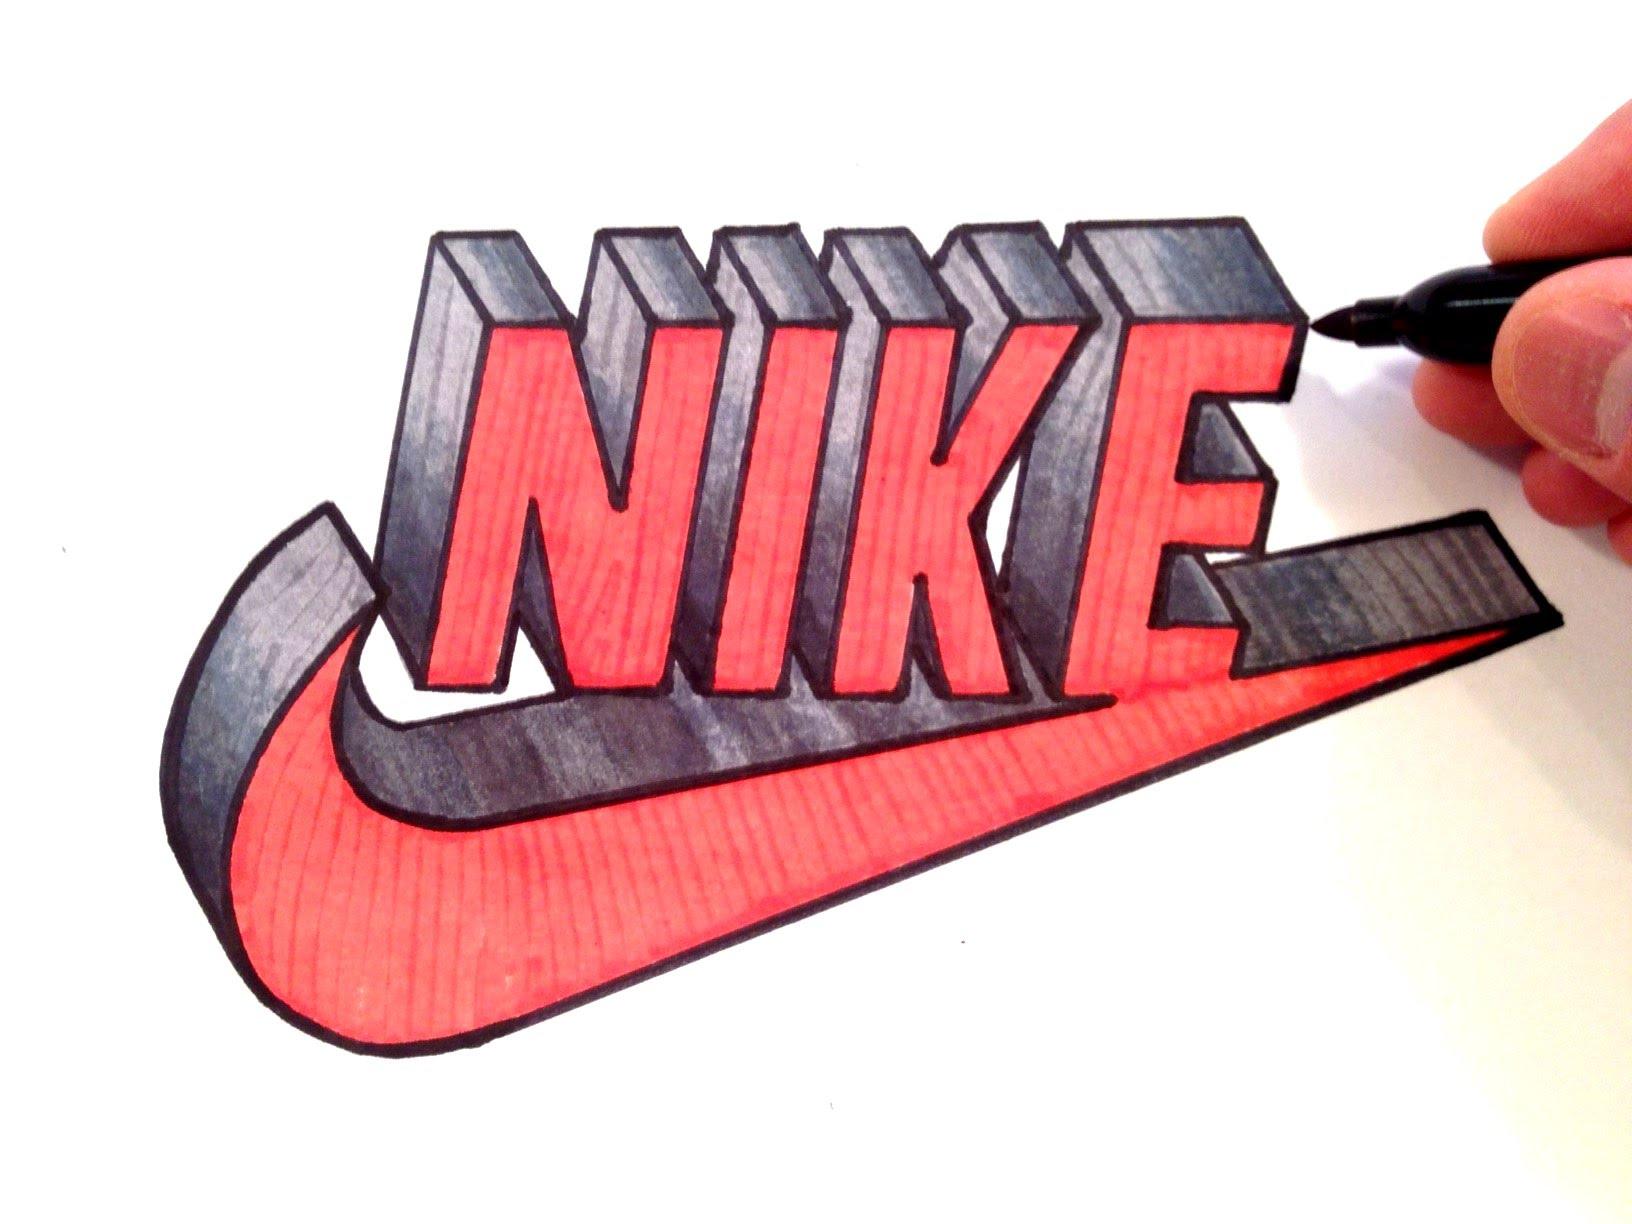 Drawn shoe nike sign How YouTube 3D Logo Nike